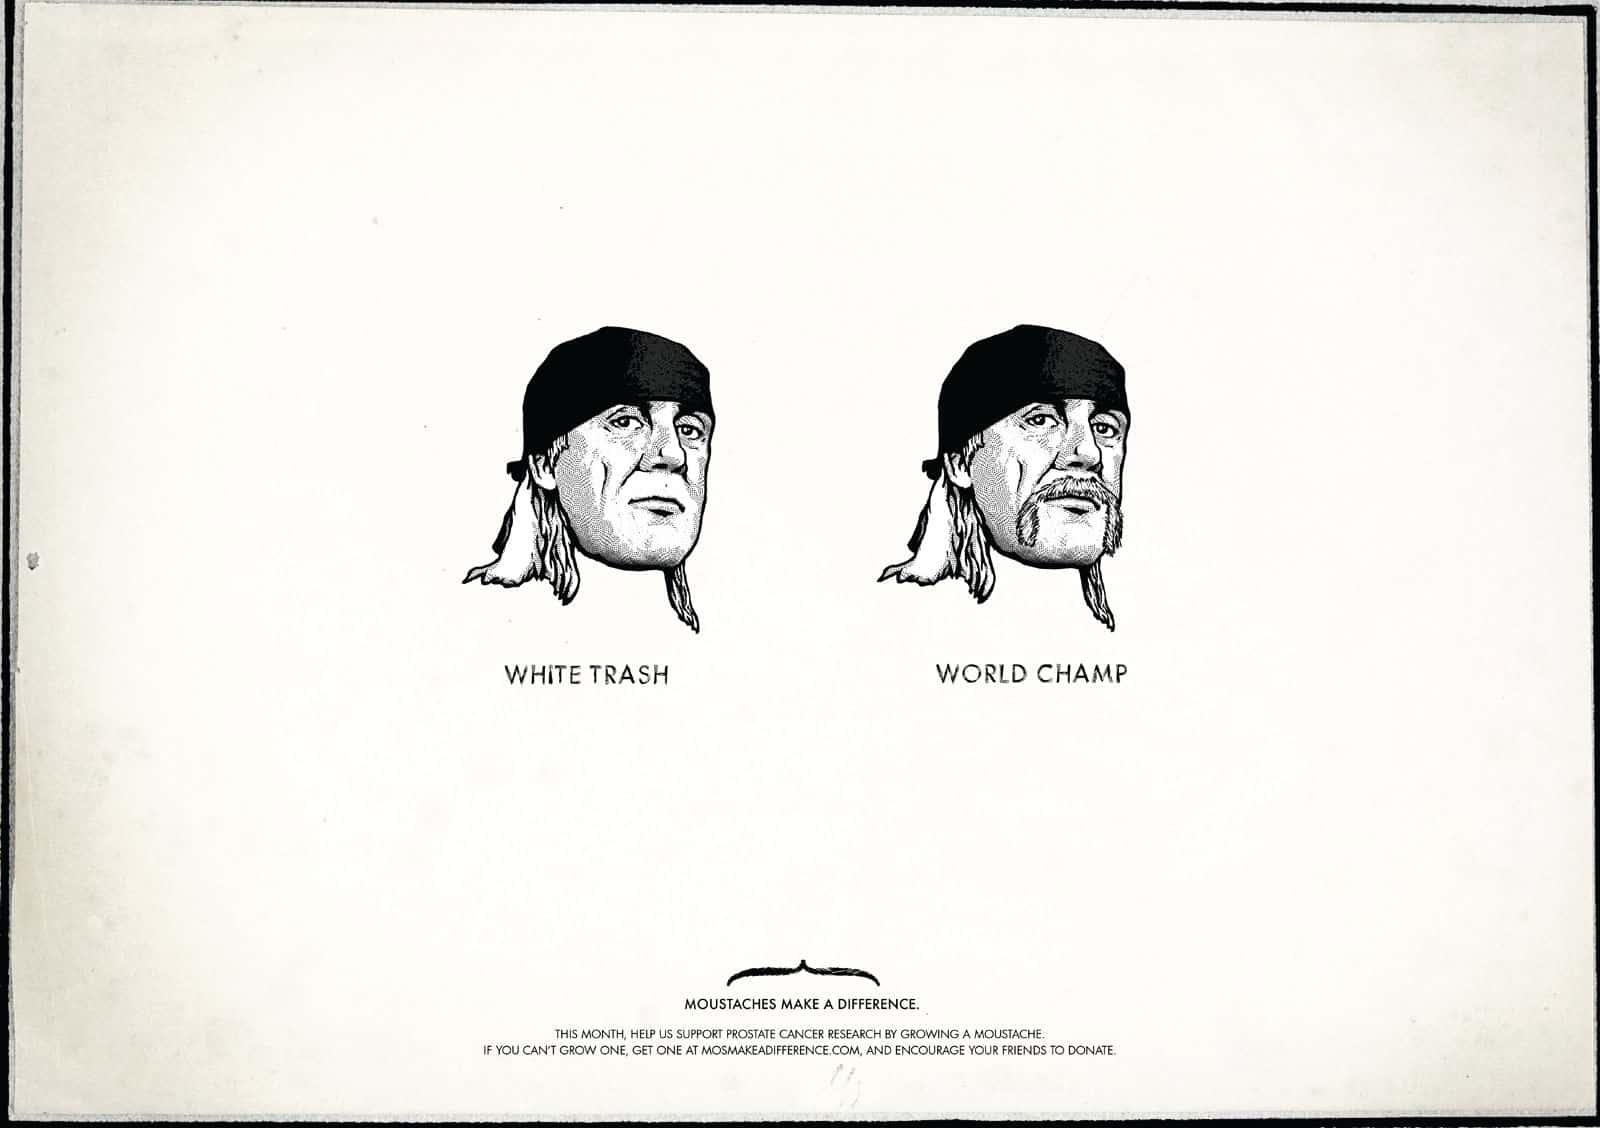 Moustaches-Make-A-Difference-Hulk-Hogan